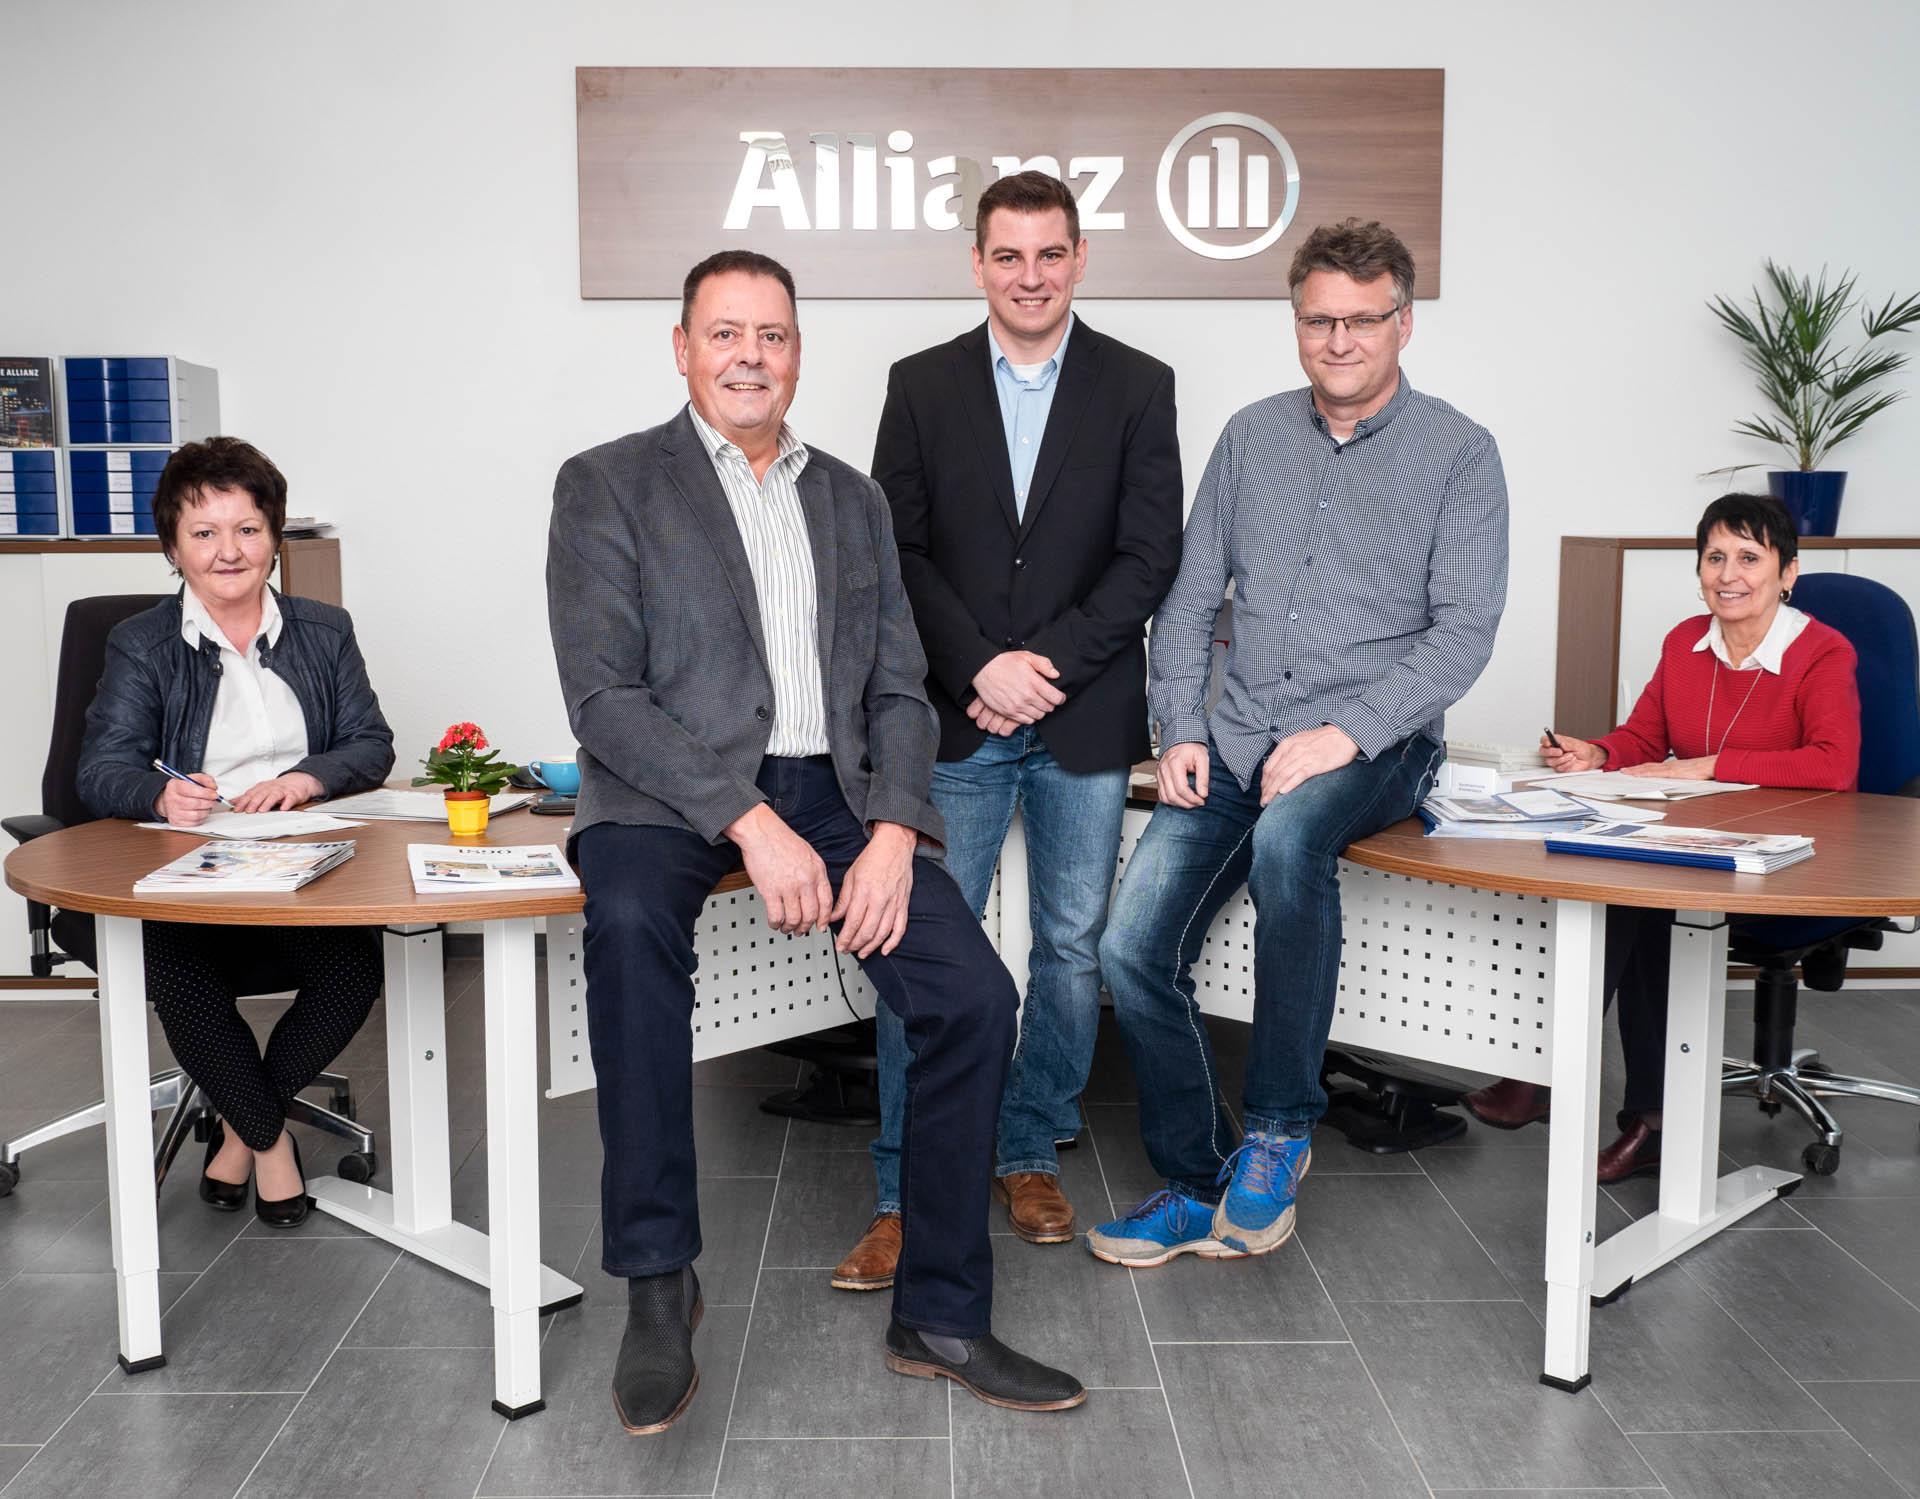 Paarshooting Leipzig - Allianz Titus Eckert